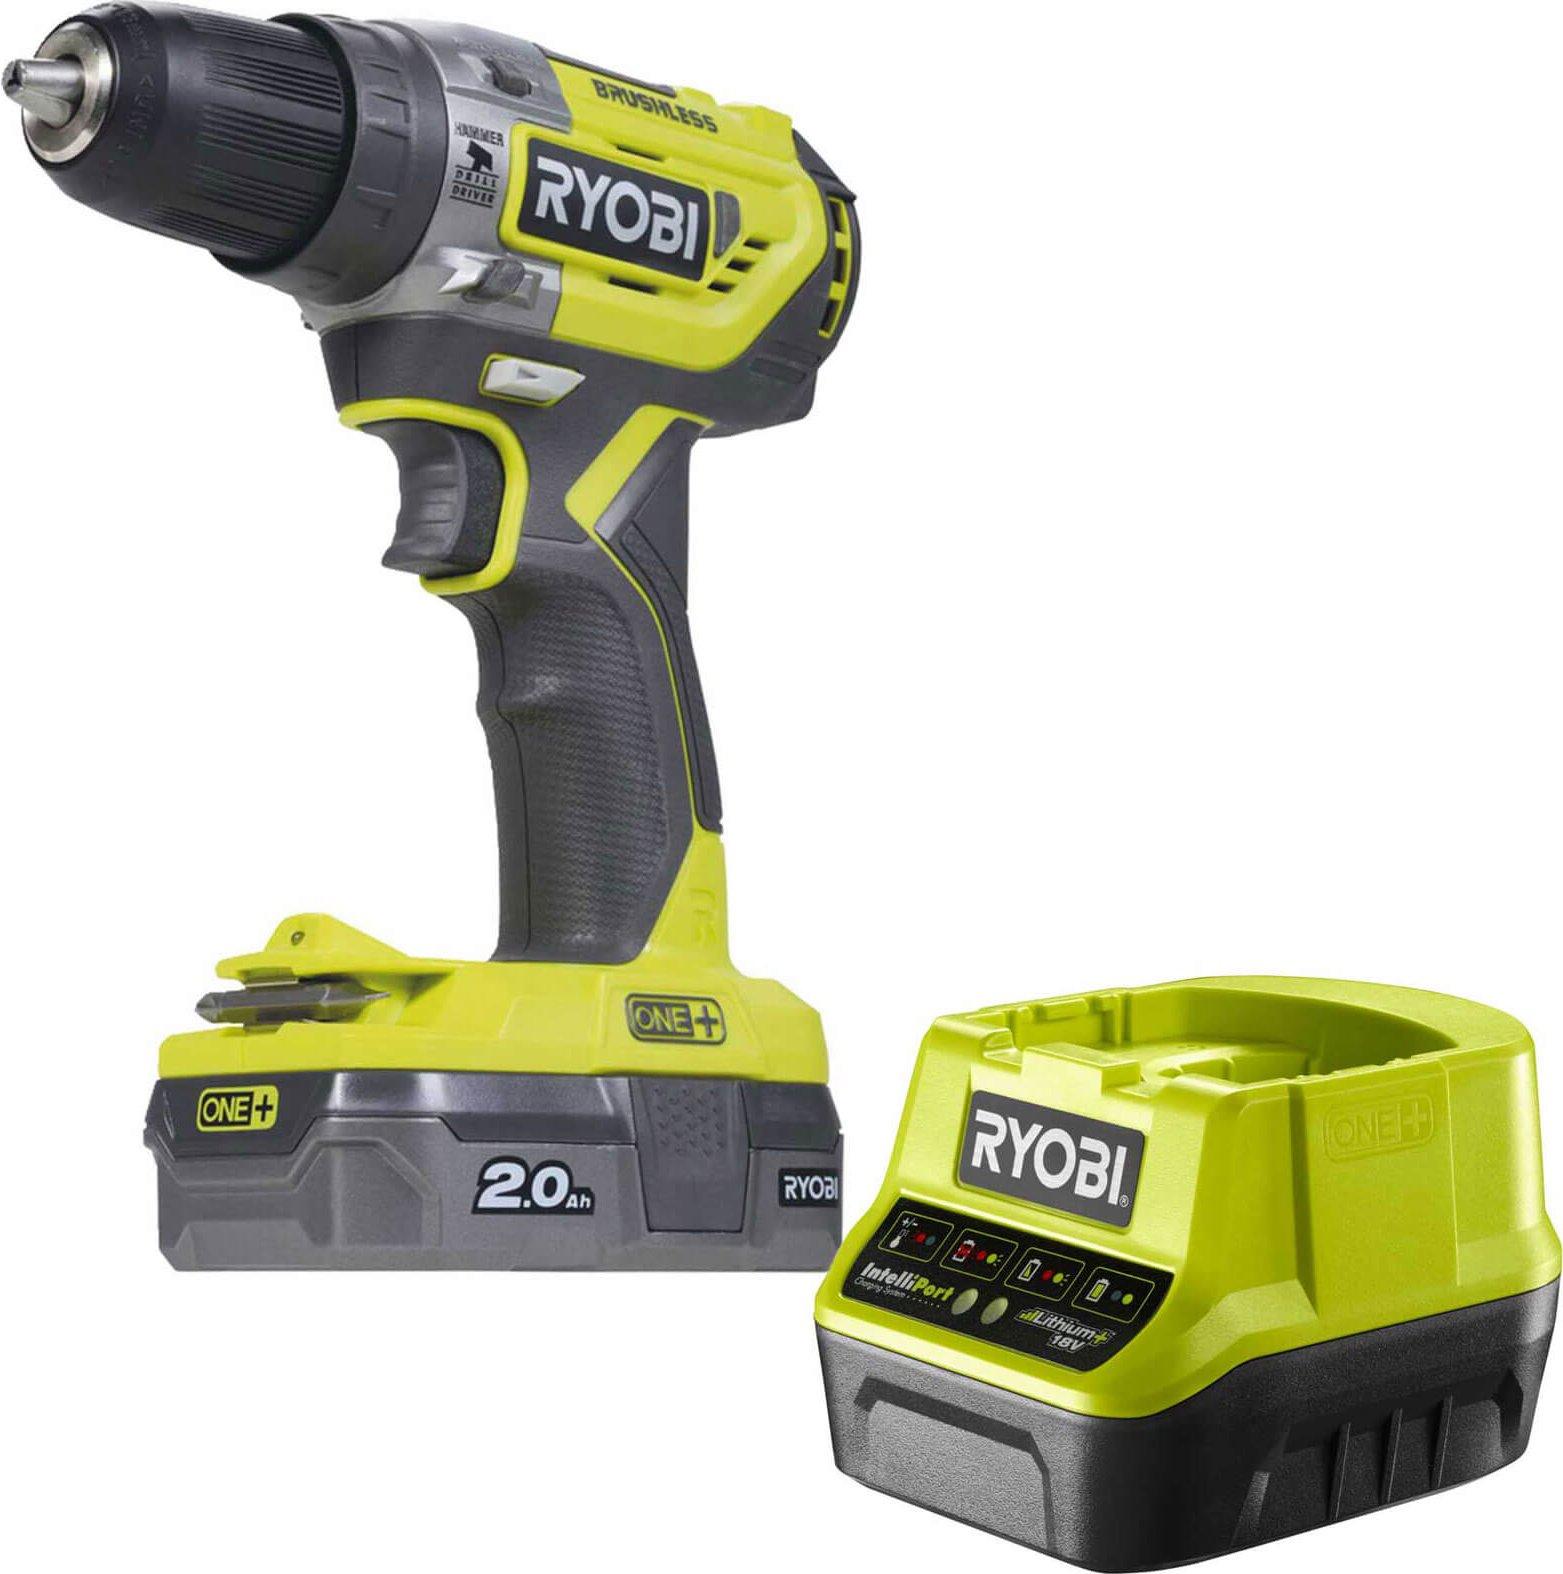 Ryobi R18PD5 ONE  18v Cordless Compact Brushless Combi Drill 1 x 2ah Li ion Charger No Case